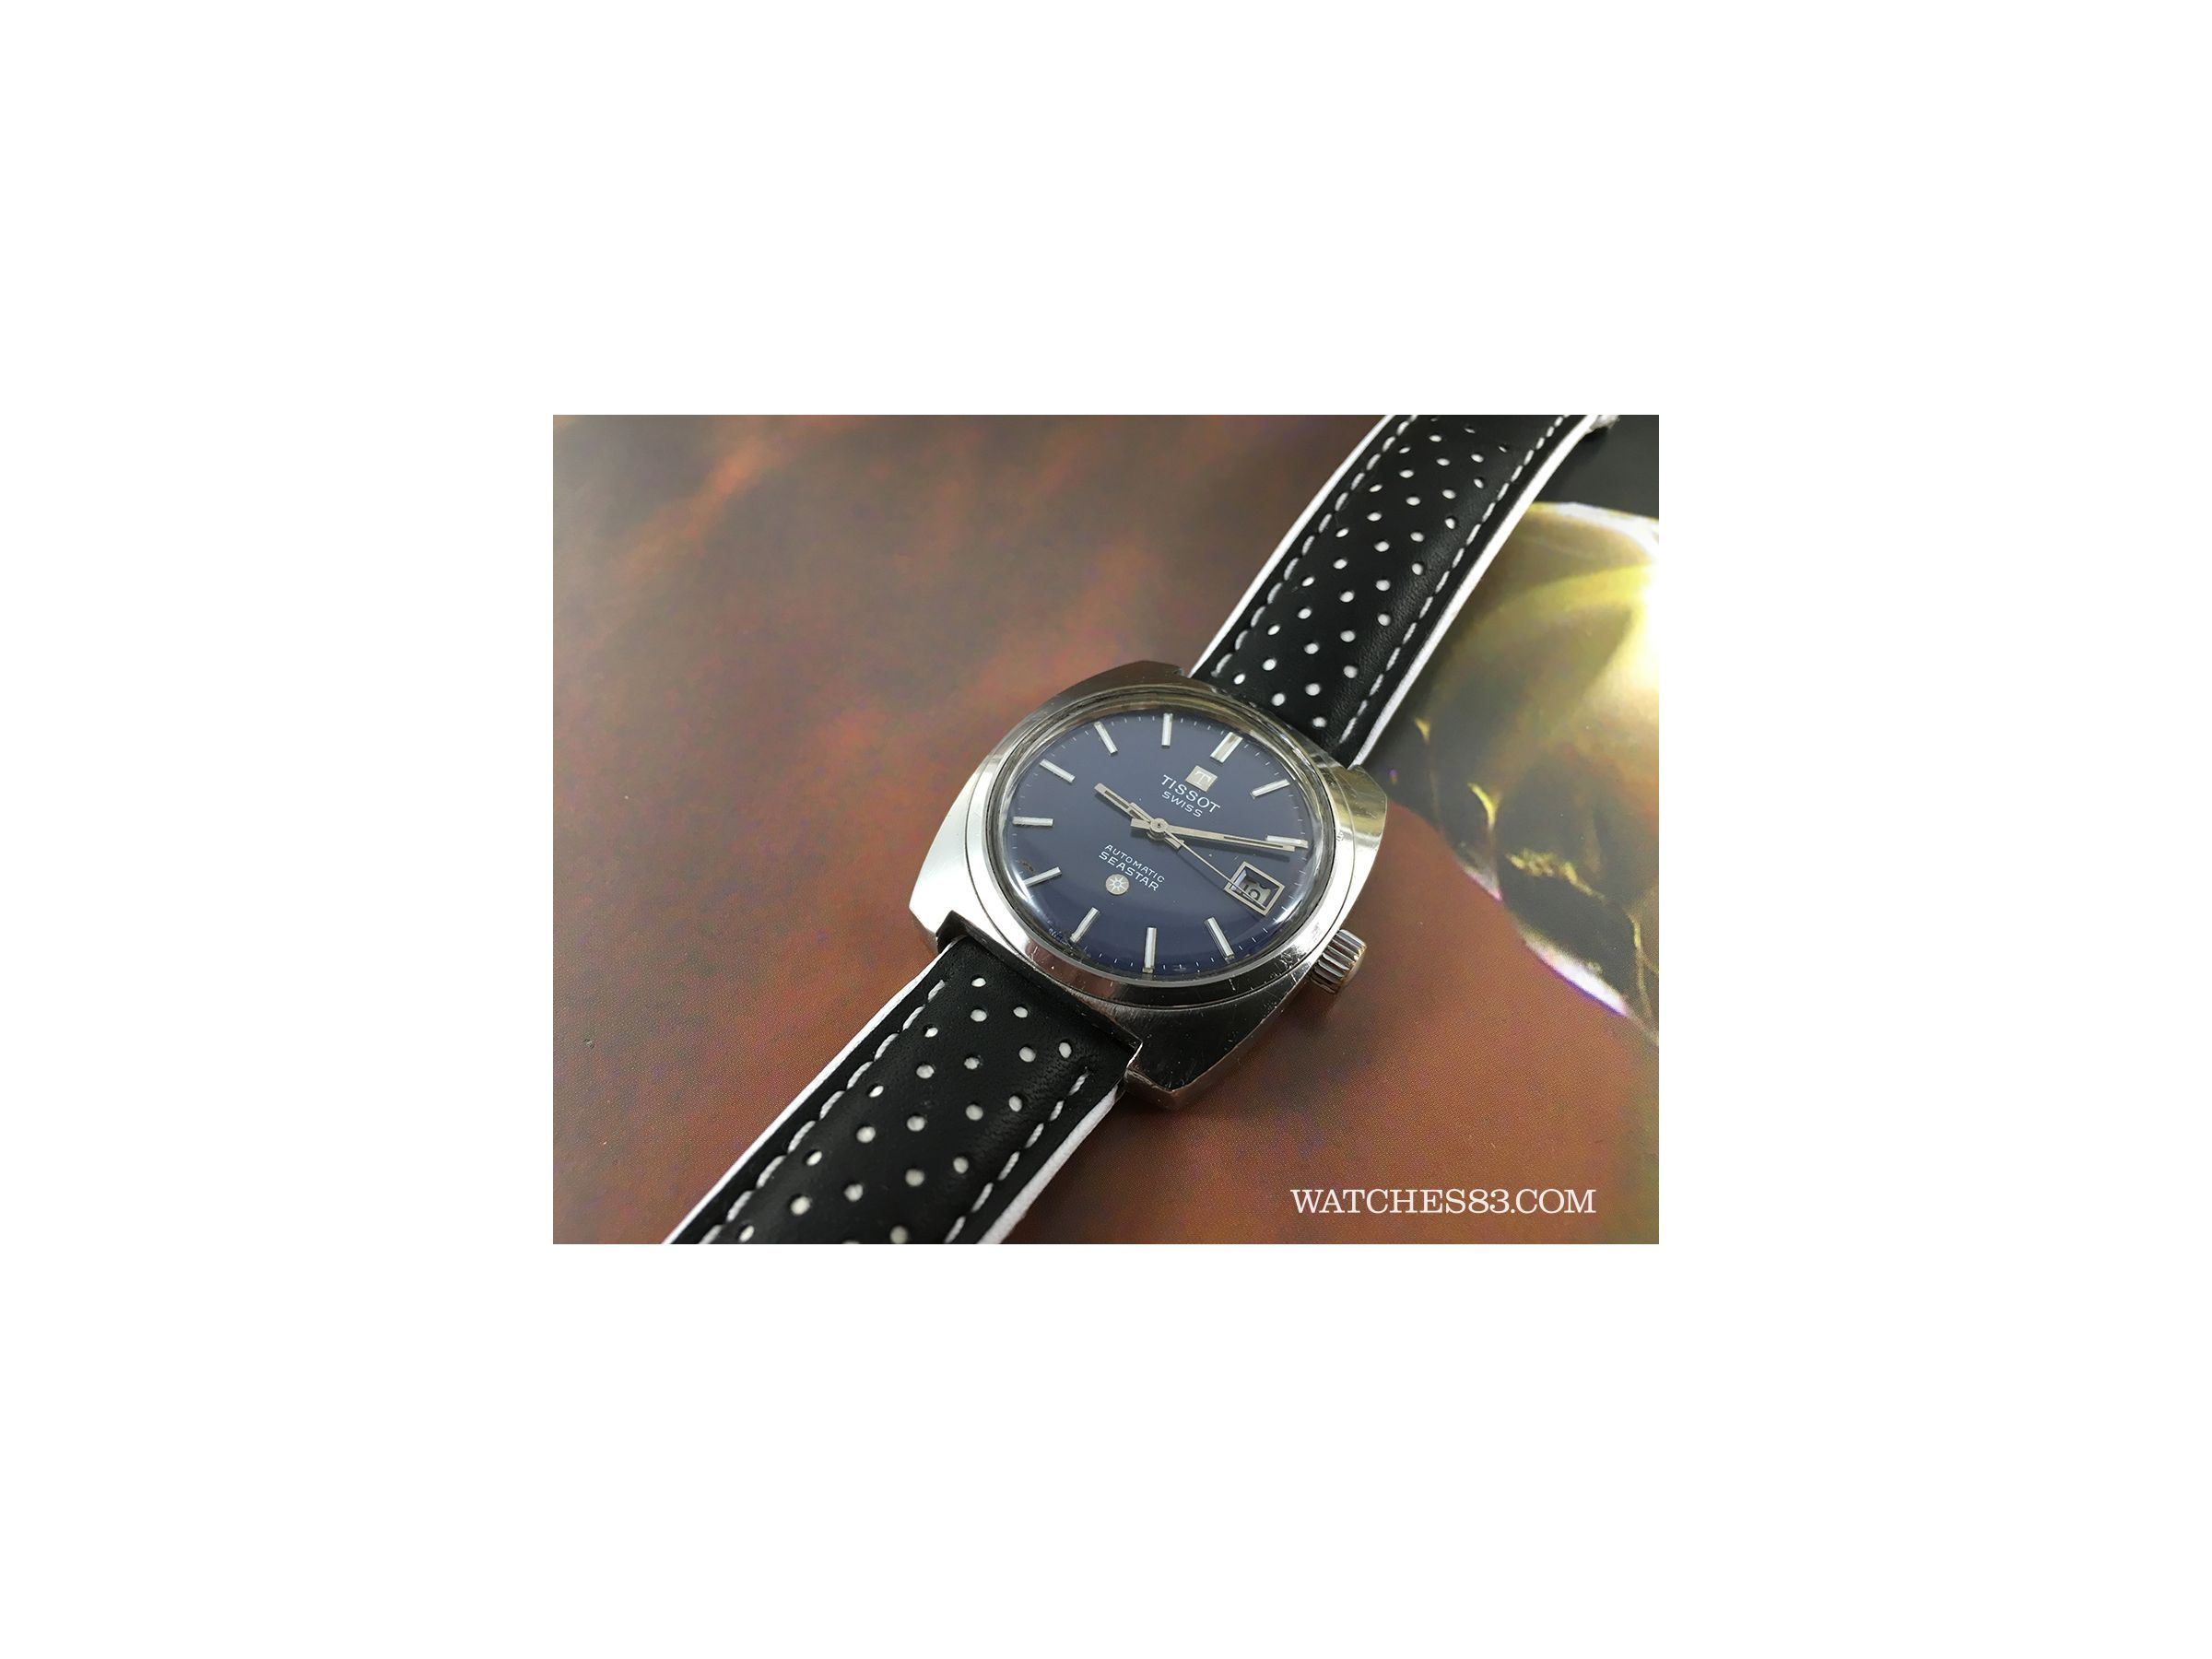 Vintage Swiss Automatic Watch Tissot Seastar Cal Tissot 2481 Watches83